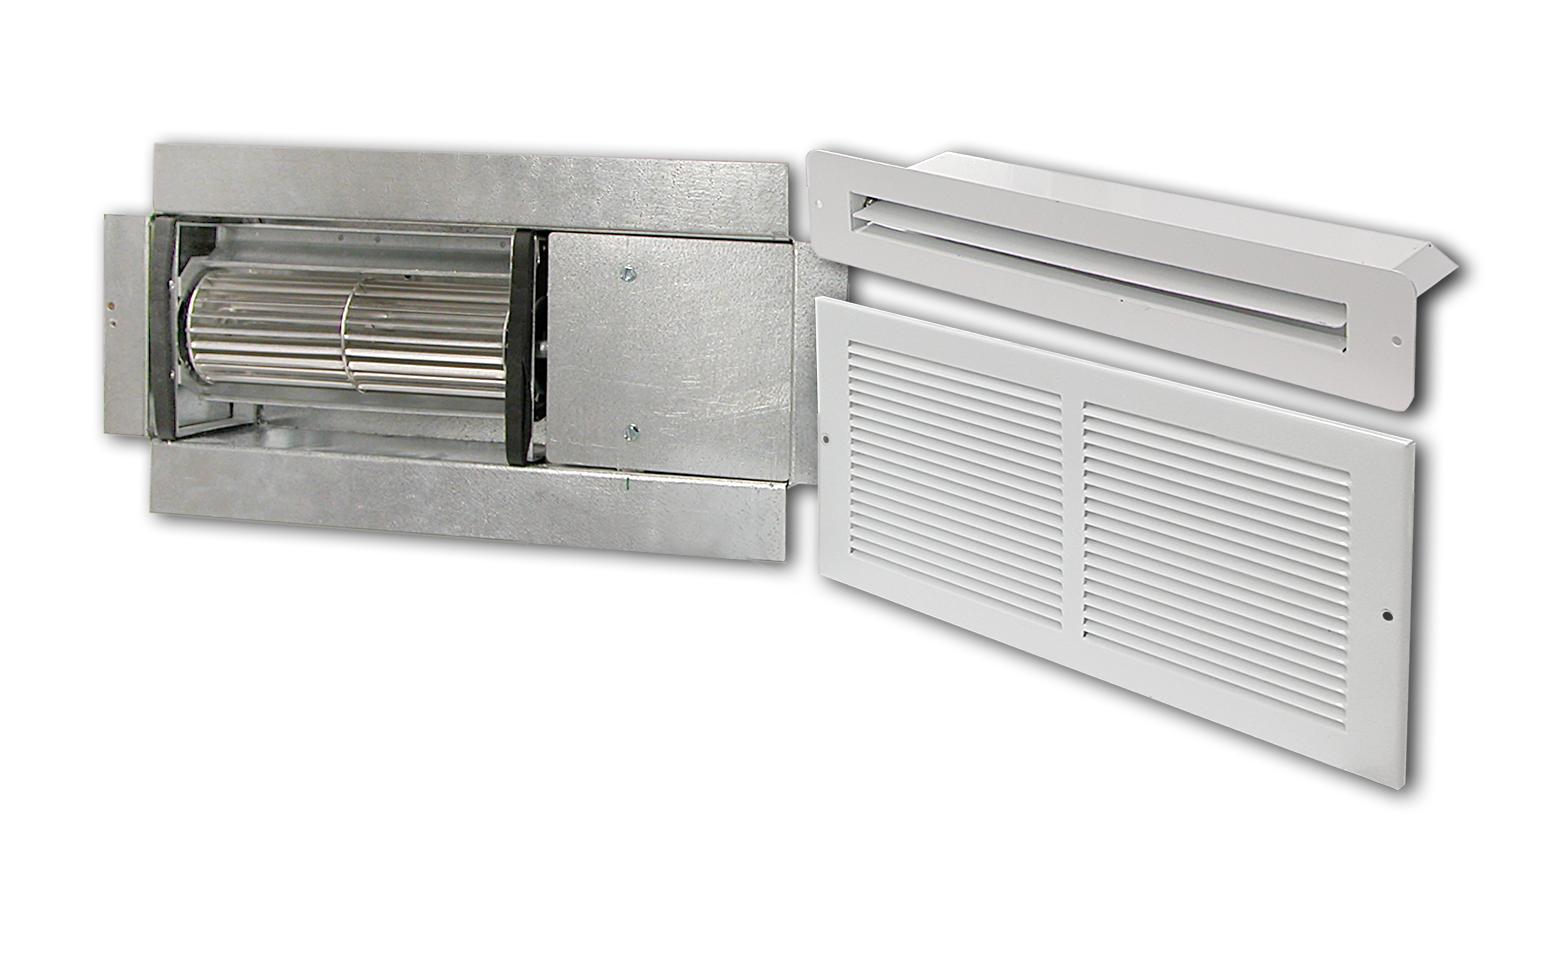 Case Studies Crawl Space Ventilation Room To Room Fan